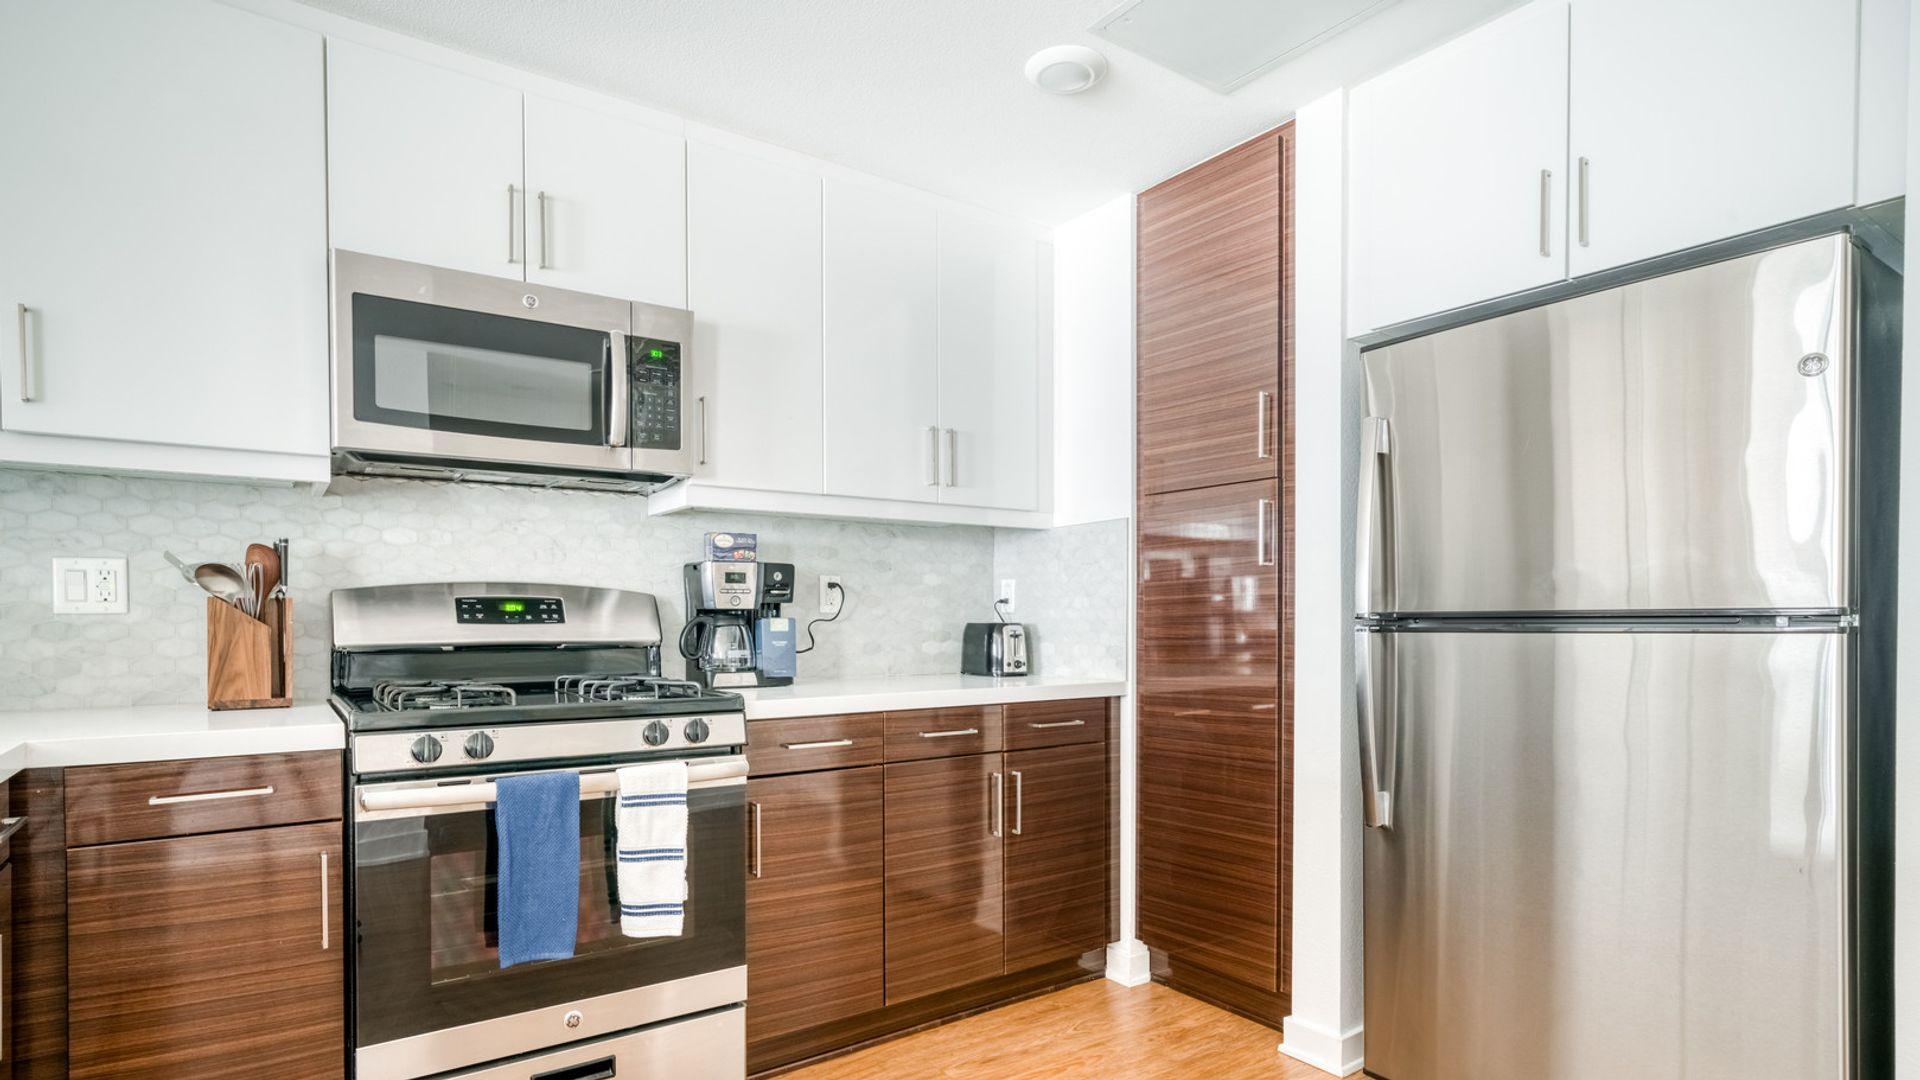 1 bed apartment at Lex On Orange, North Central Avenue ...